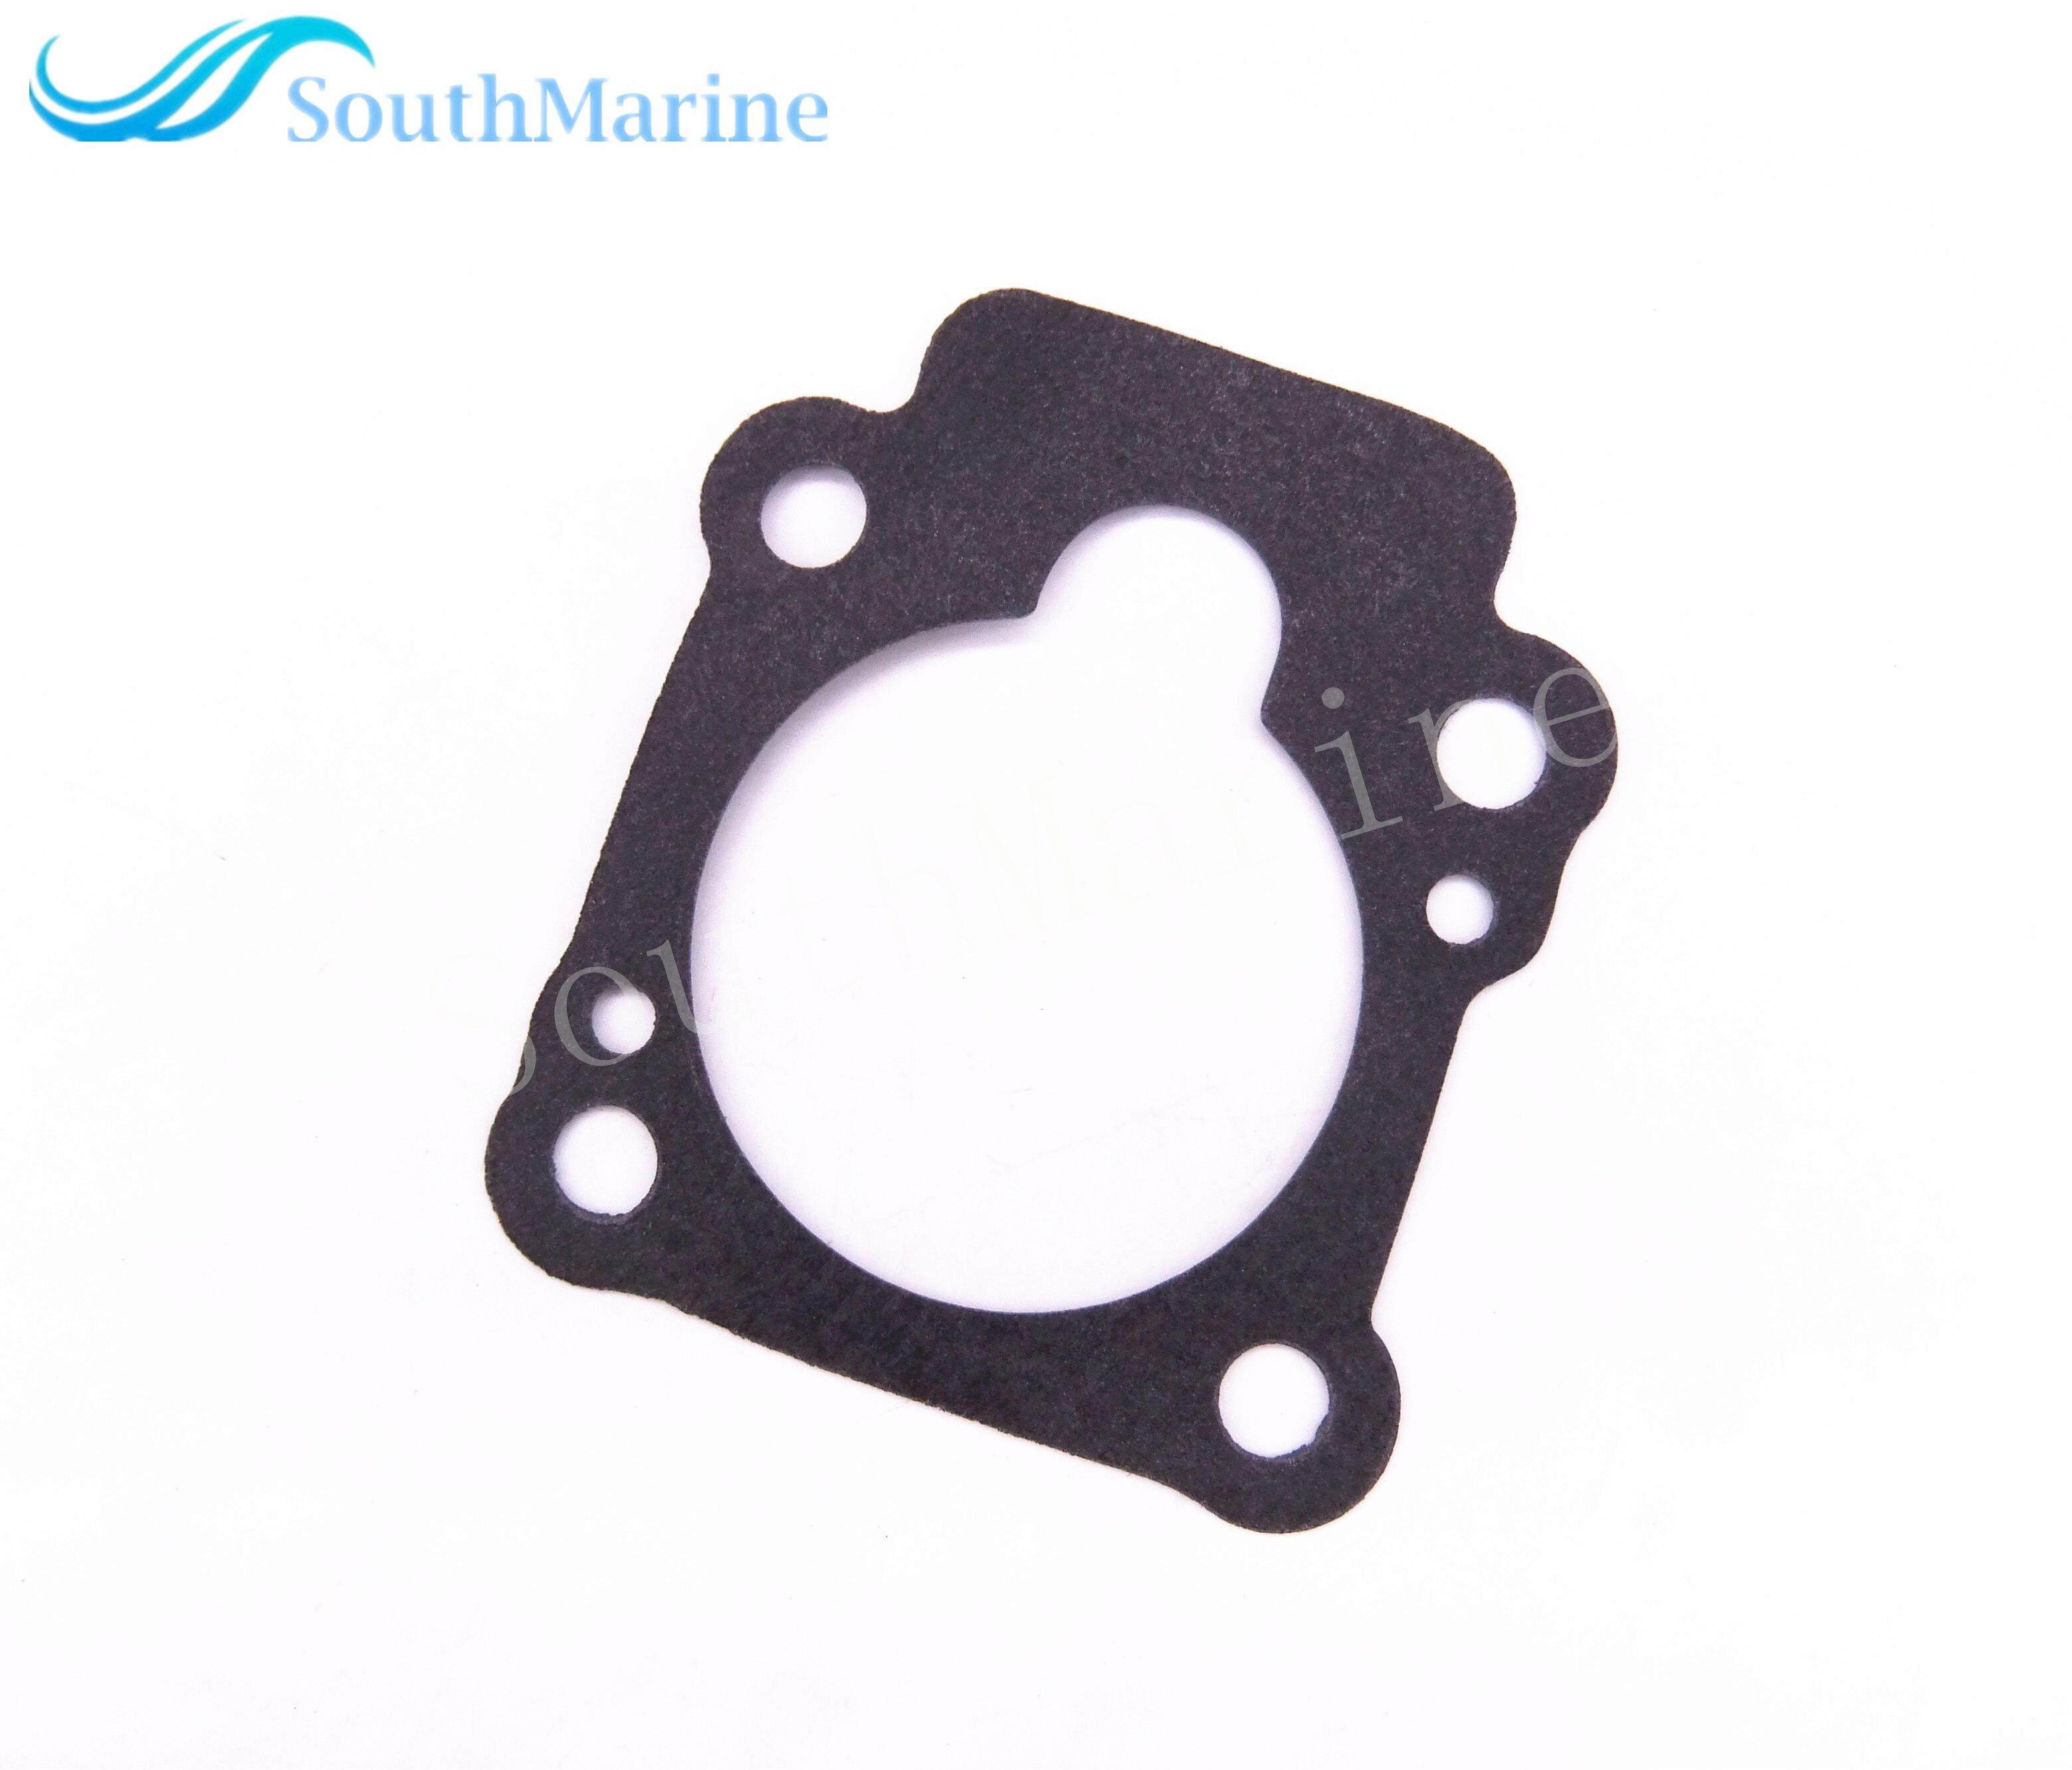 Outboard Engine 3B2-65018-0 3B265-0180M Water Pump Case Gasket For Tohatsu Nissan 2-Stroke 6HP 8HP 9.8HP Boat Motor